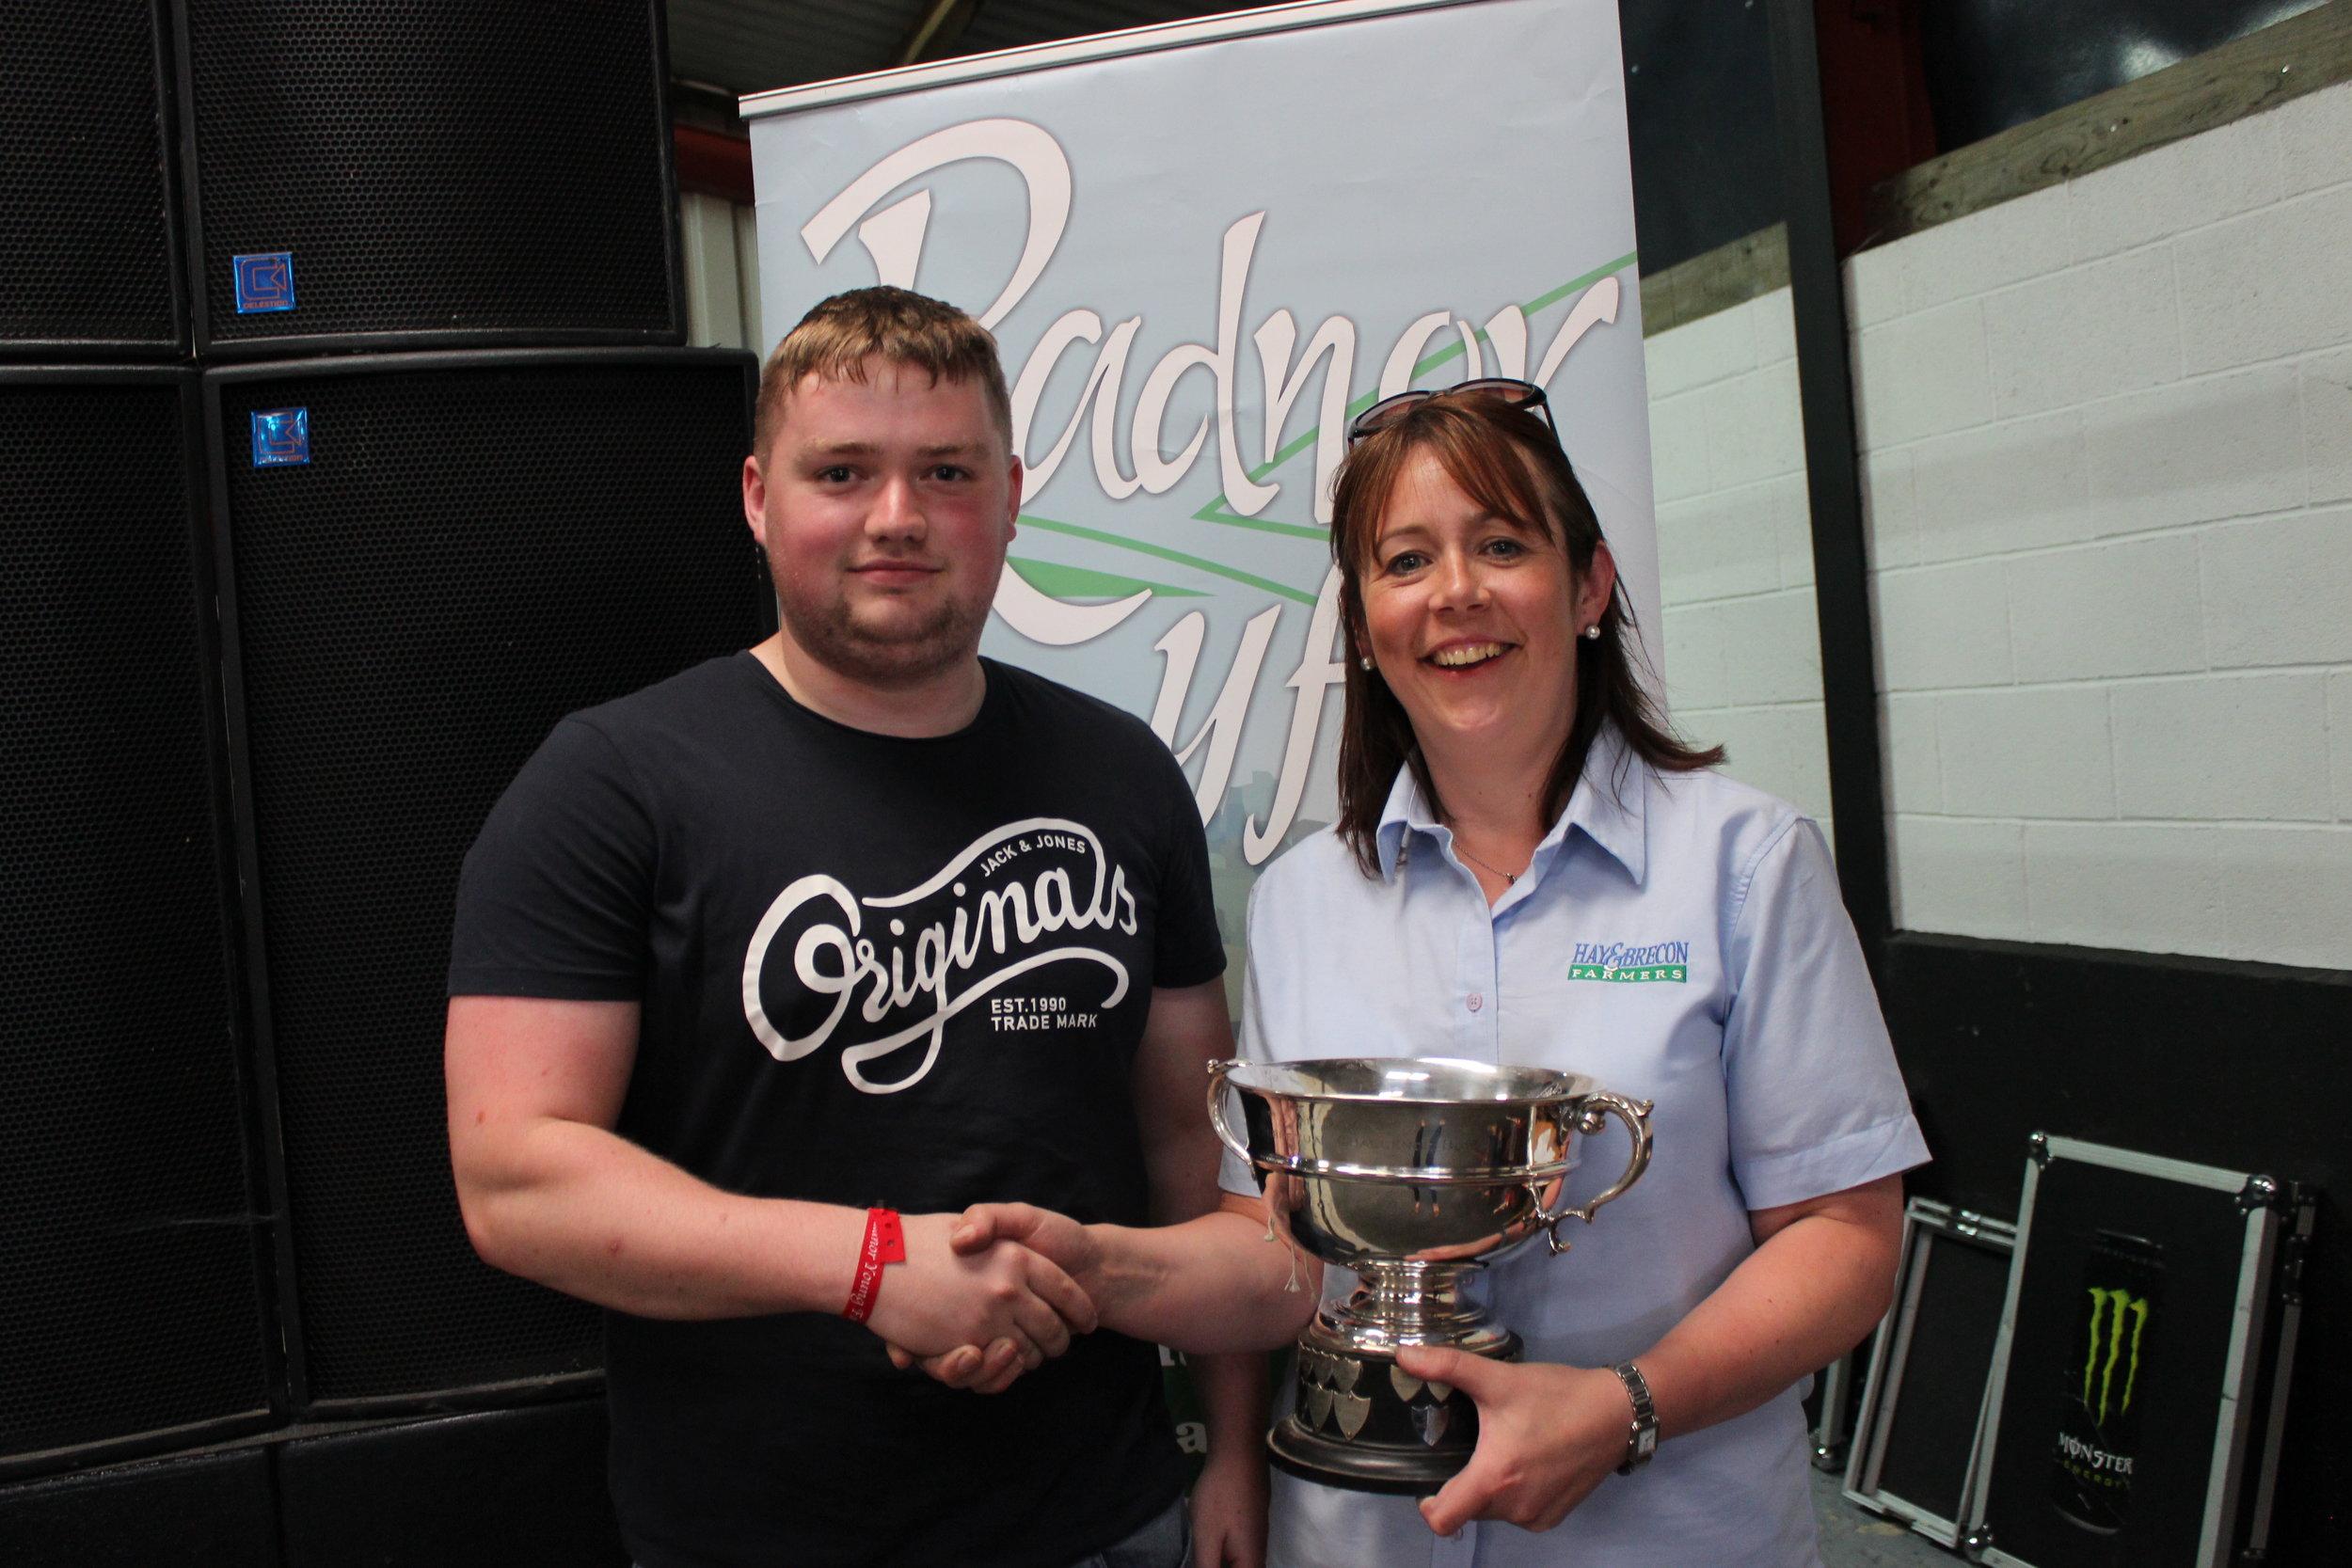 Tom Groves, Presteigne YFC - Mrs Evan Davies Memorial Rose Bowl / Cookery & Craft Competitions